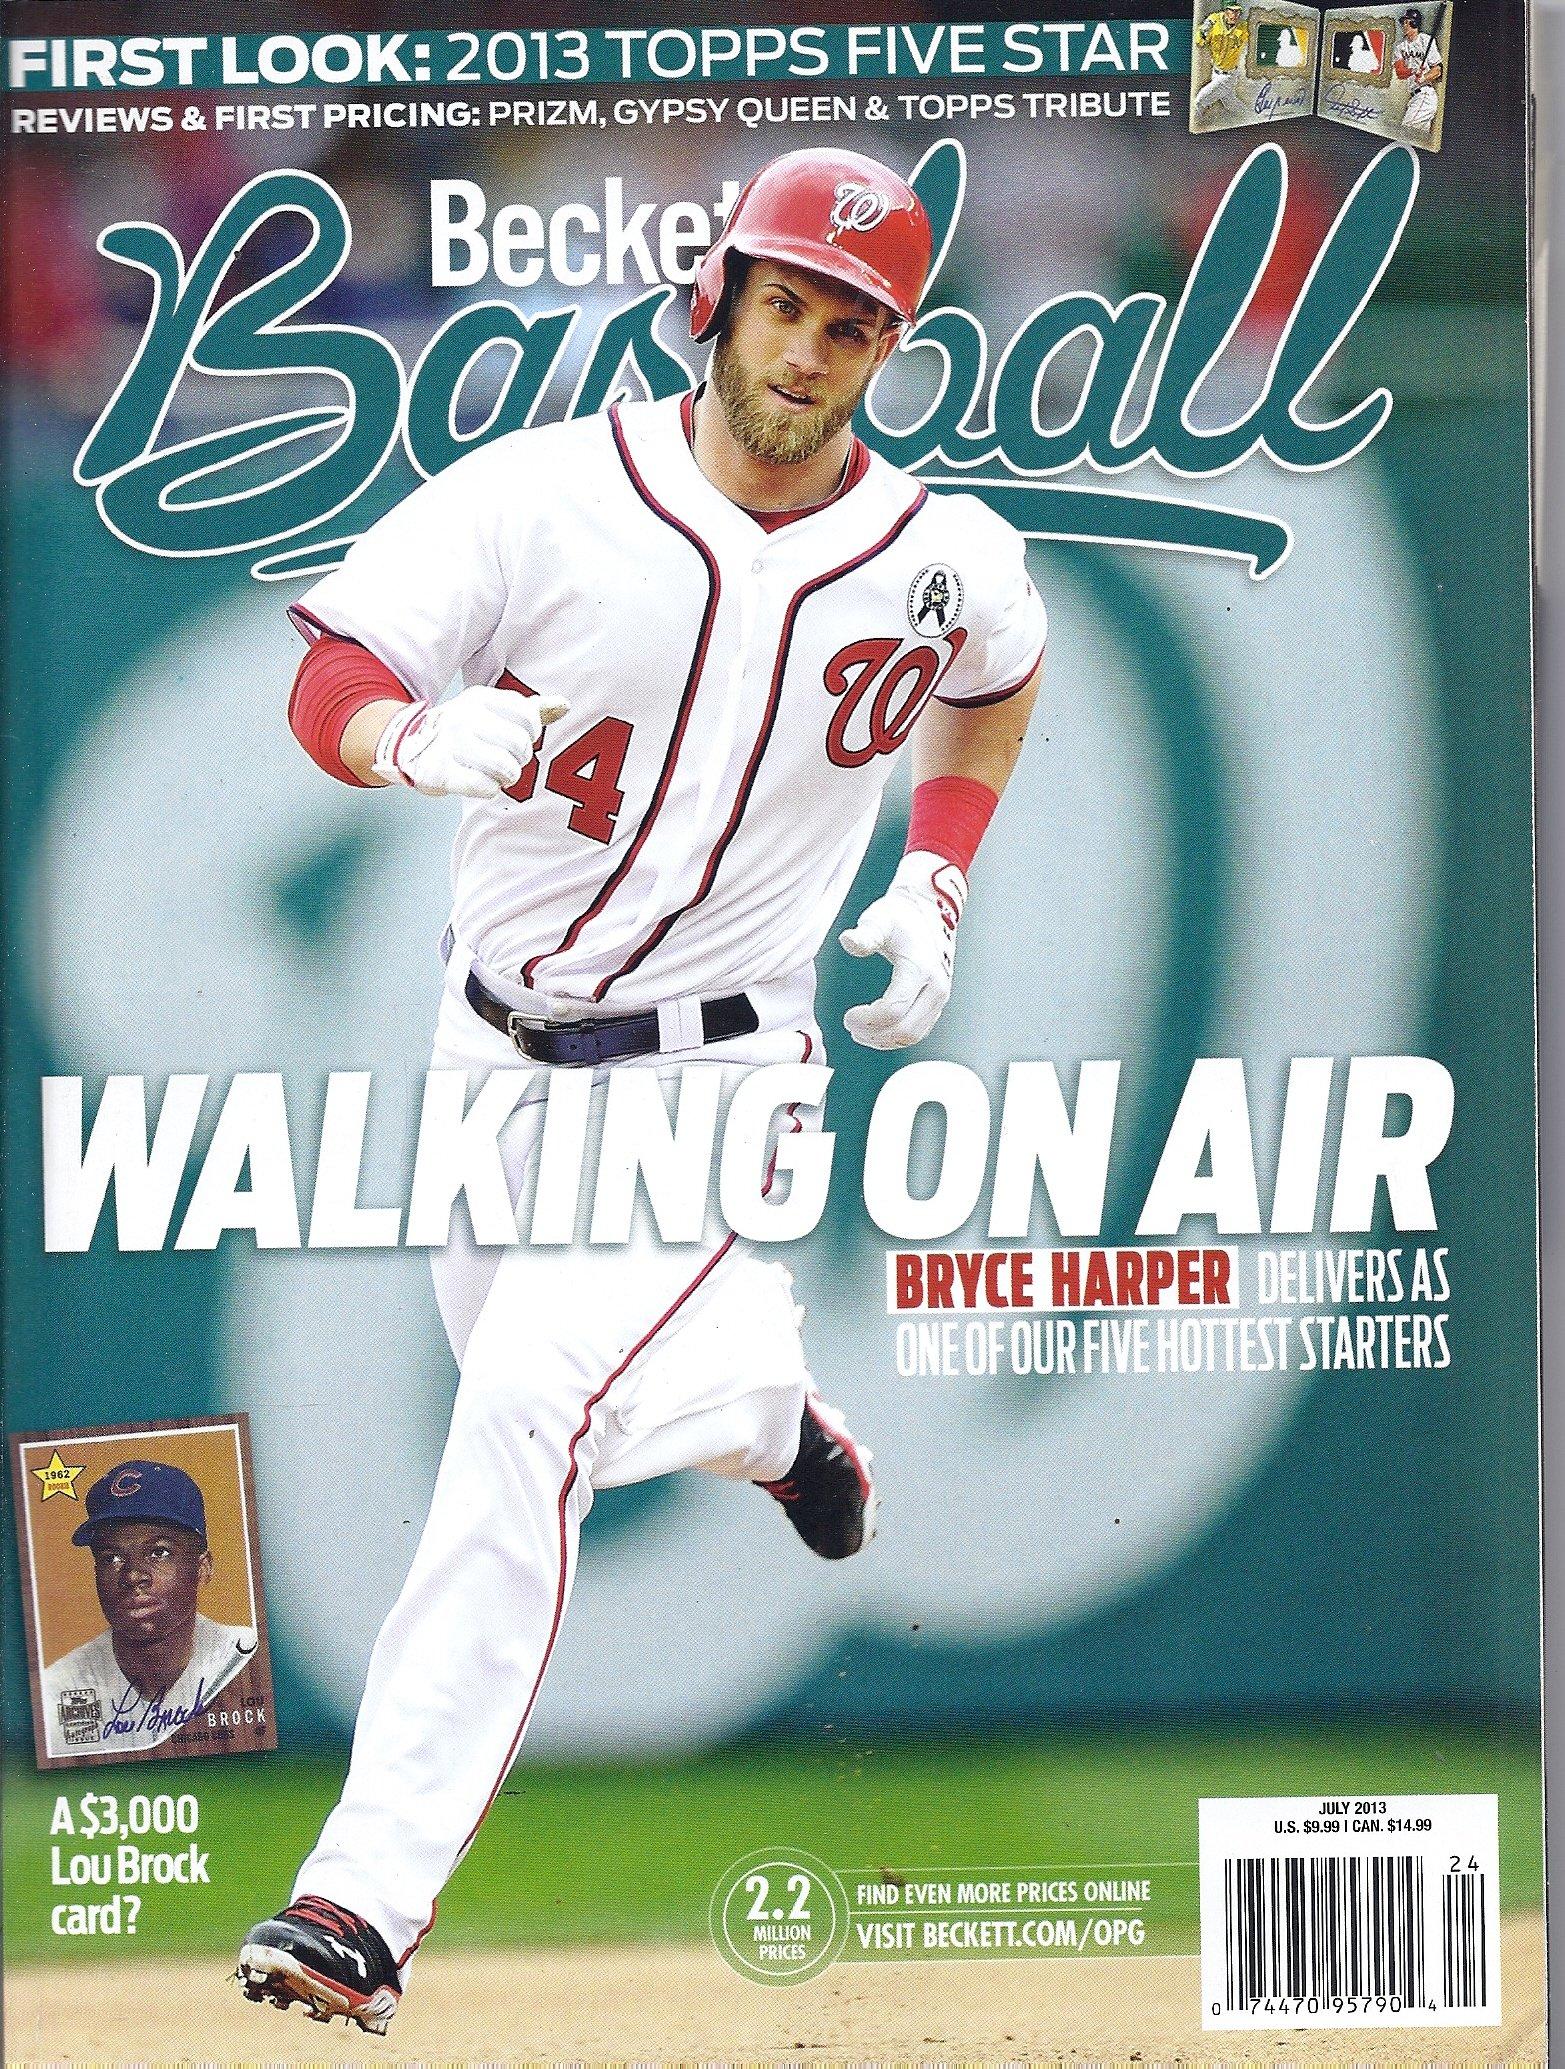 Beckett Baseball July 2013 Bryce Harper Cover Chris